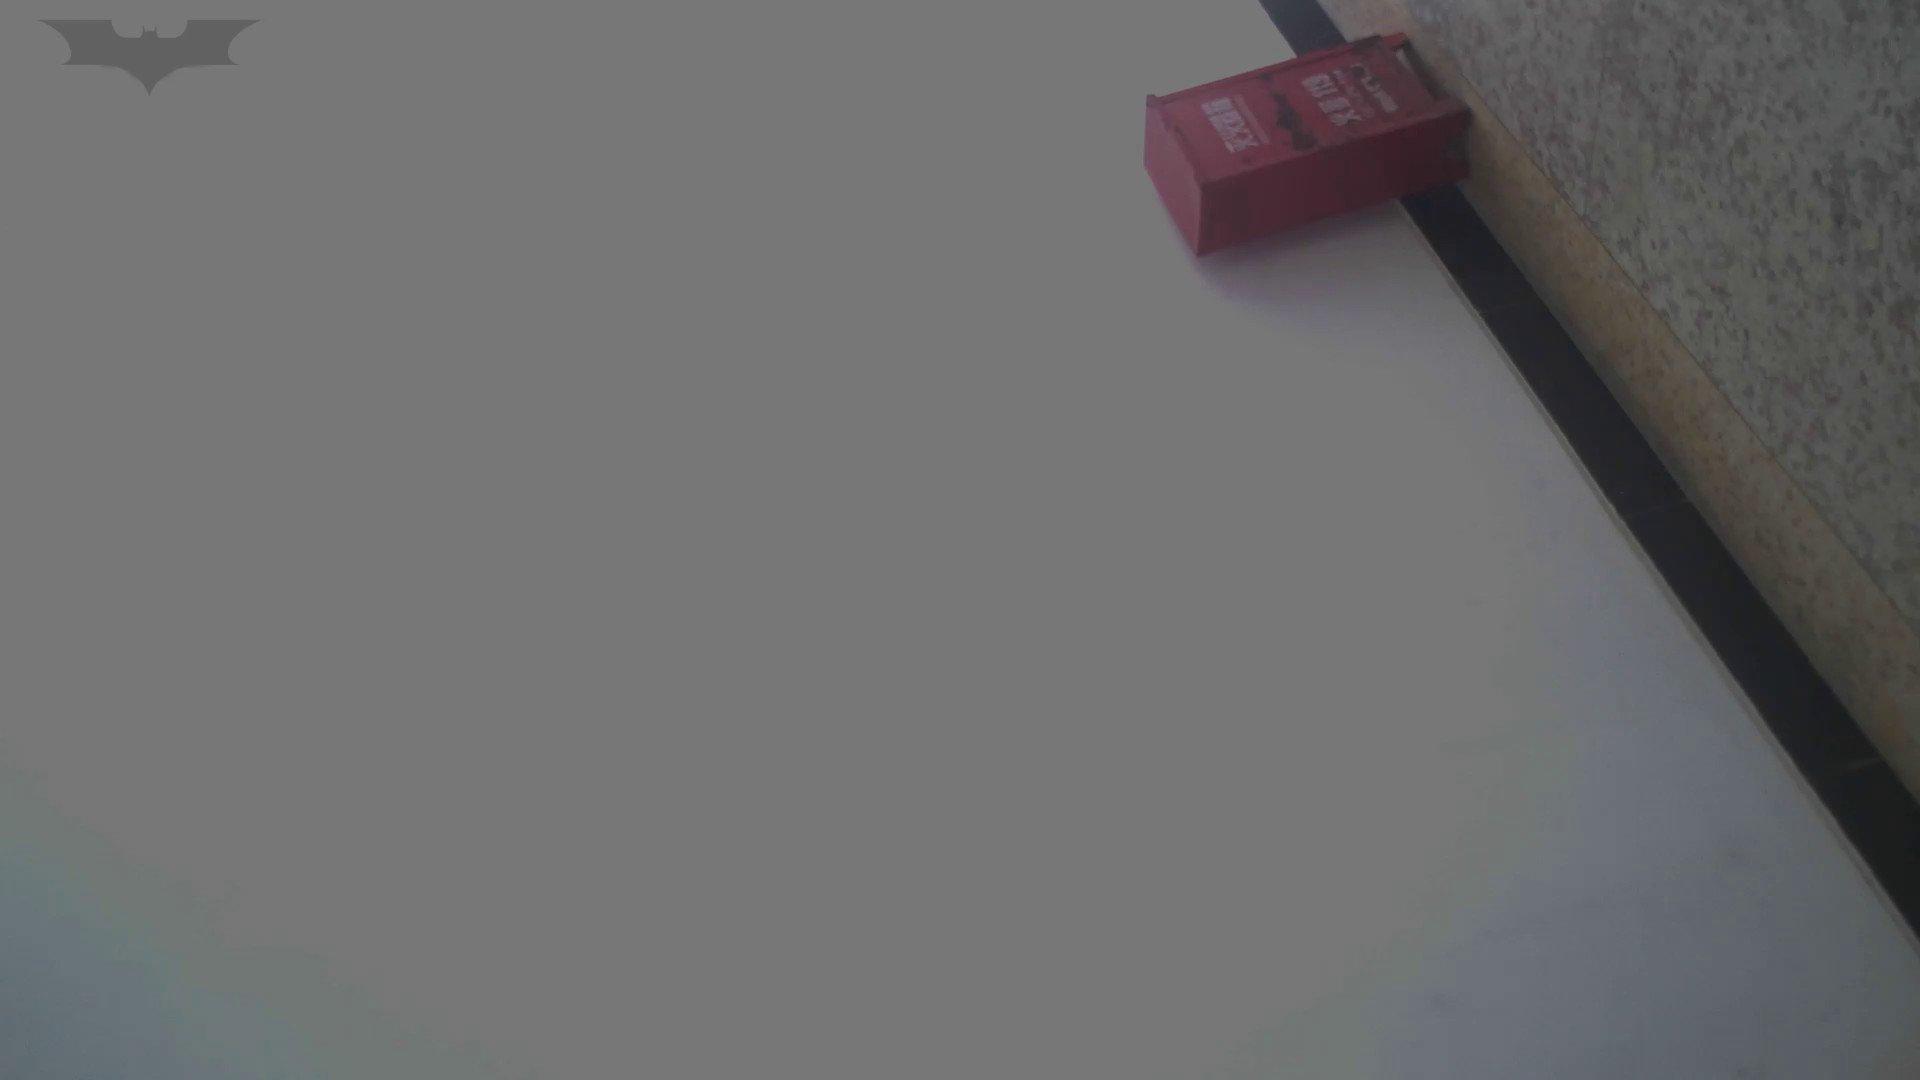 JD盗撮 美女の洗面所の秘密 Vol.09 盗撮映像大放出 エロ画像 87連発 58